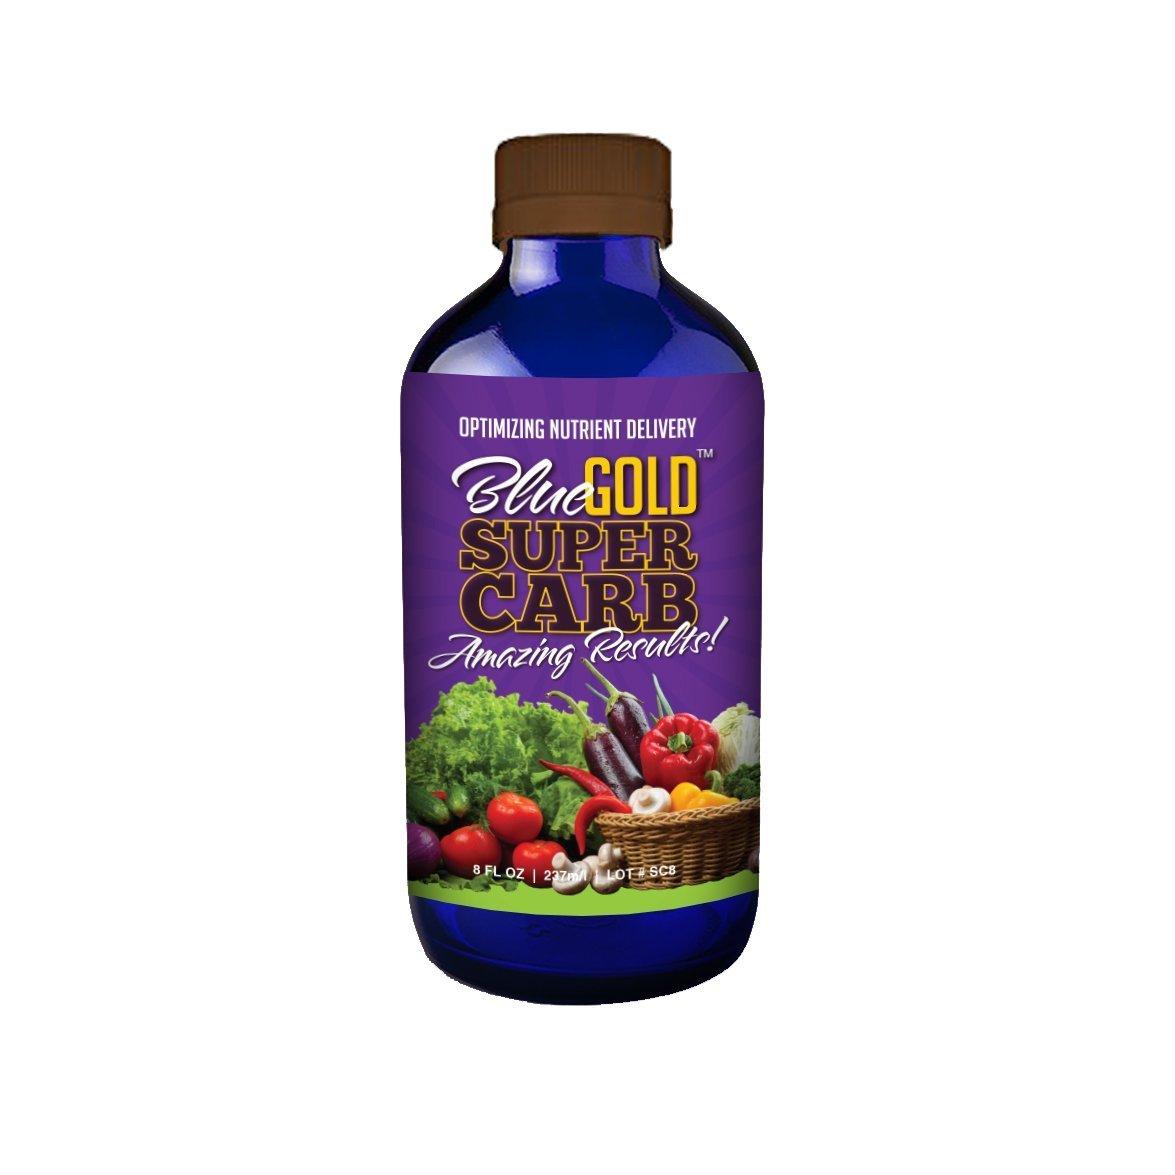 Blue Gold Super Carb, Organic Plant Syrup Enhanced Molasses, Concentrate 8 fl. oz. Bottle